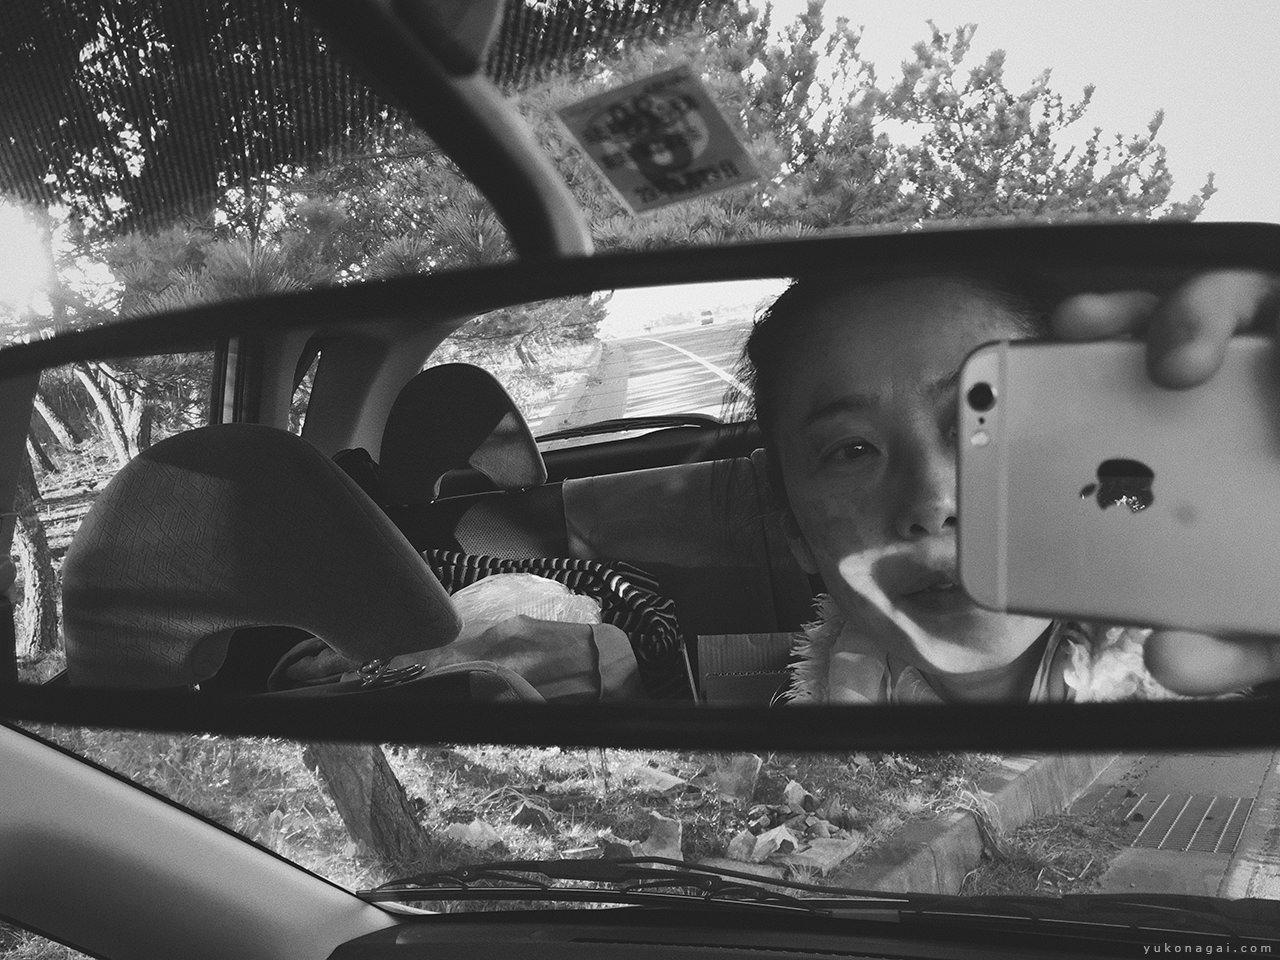 A rear view mirror self portrait.